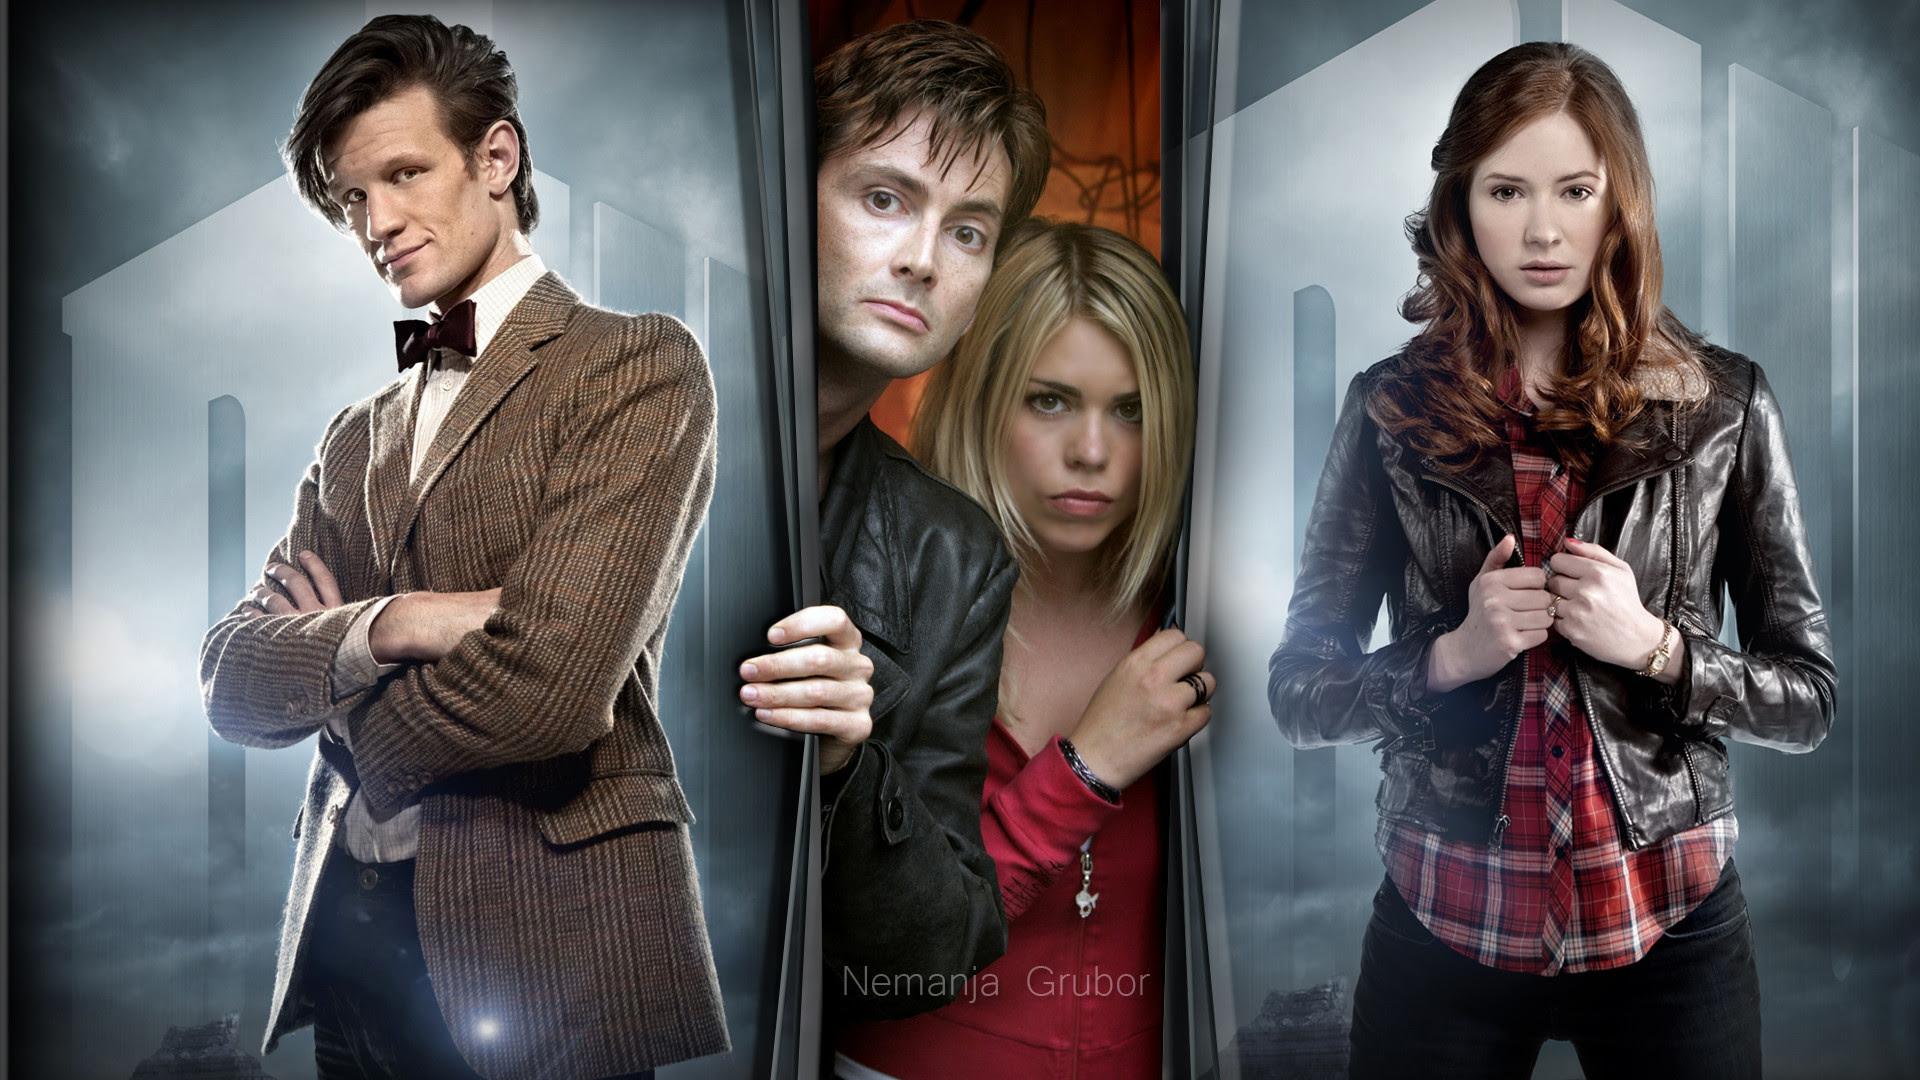 Doctor Who Season 9 Wallpaper 75 Images